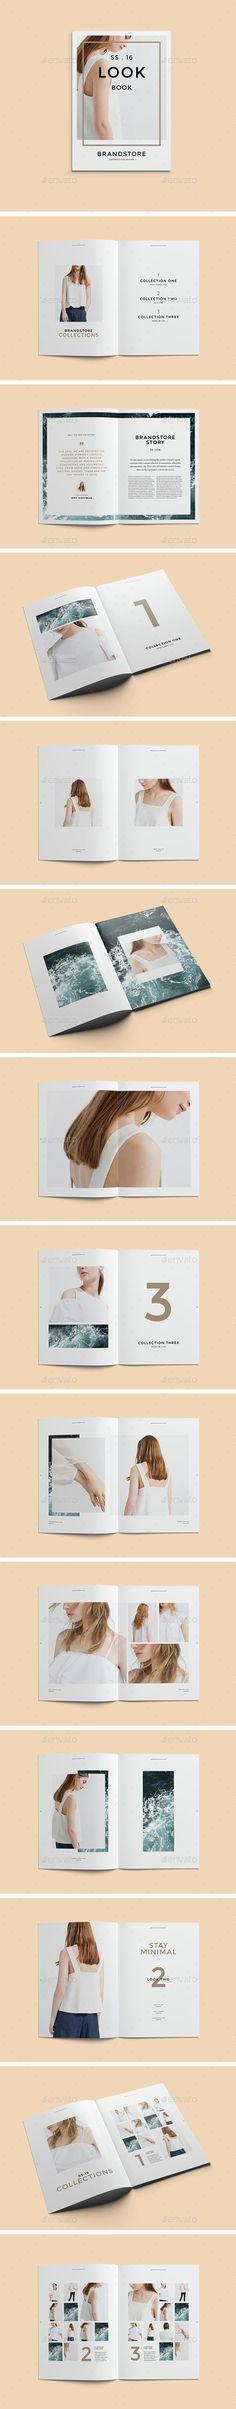 Fashion Lookbook Template InDesign INDD. Download here: http://graphicriver.net/item/fashion-lookbook/15042234?ref=ksioks: